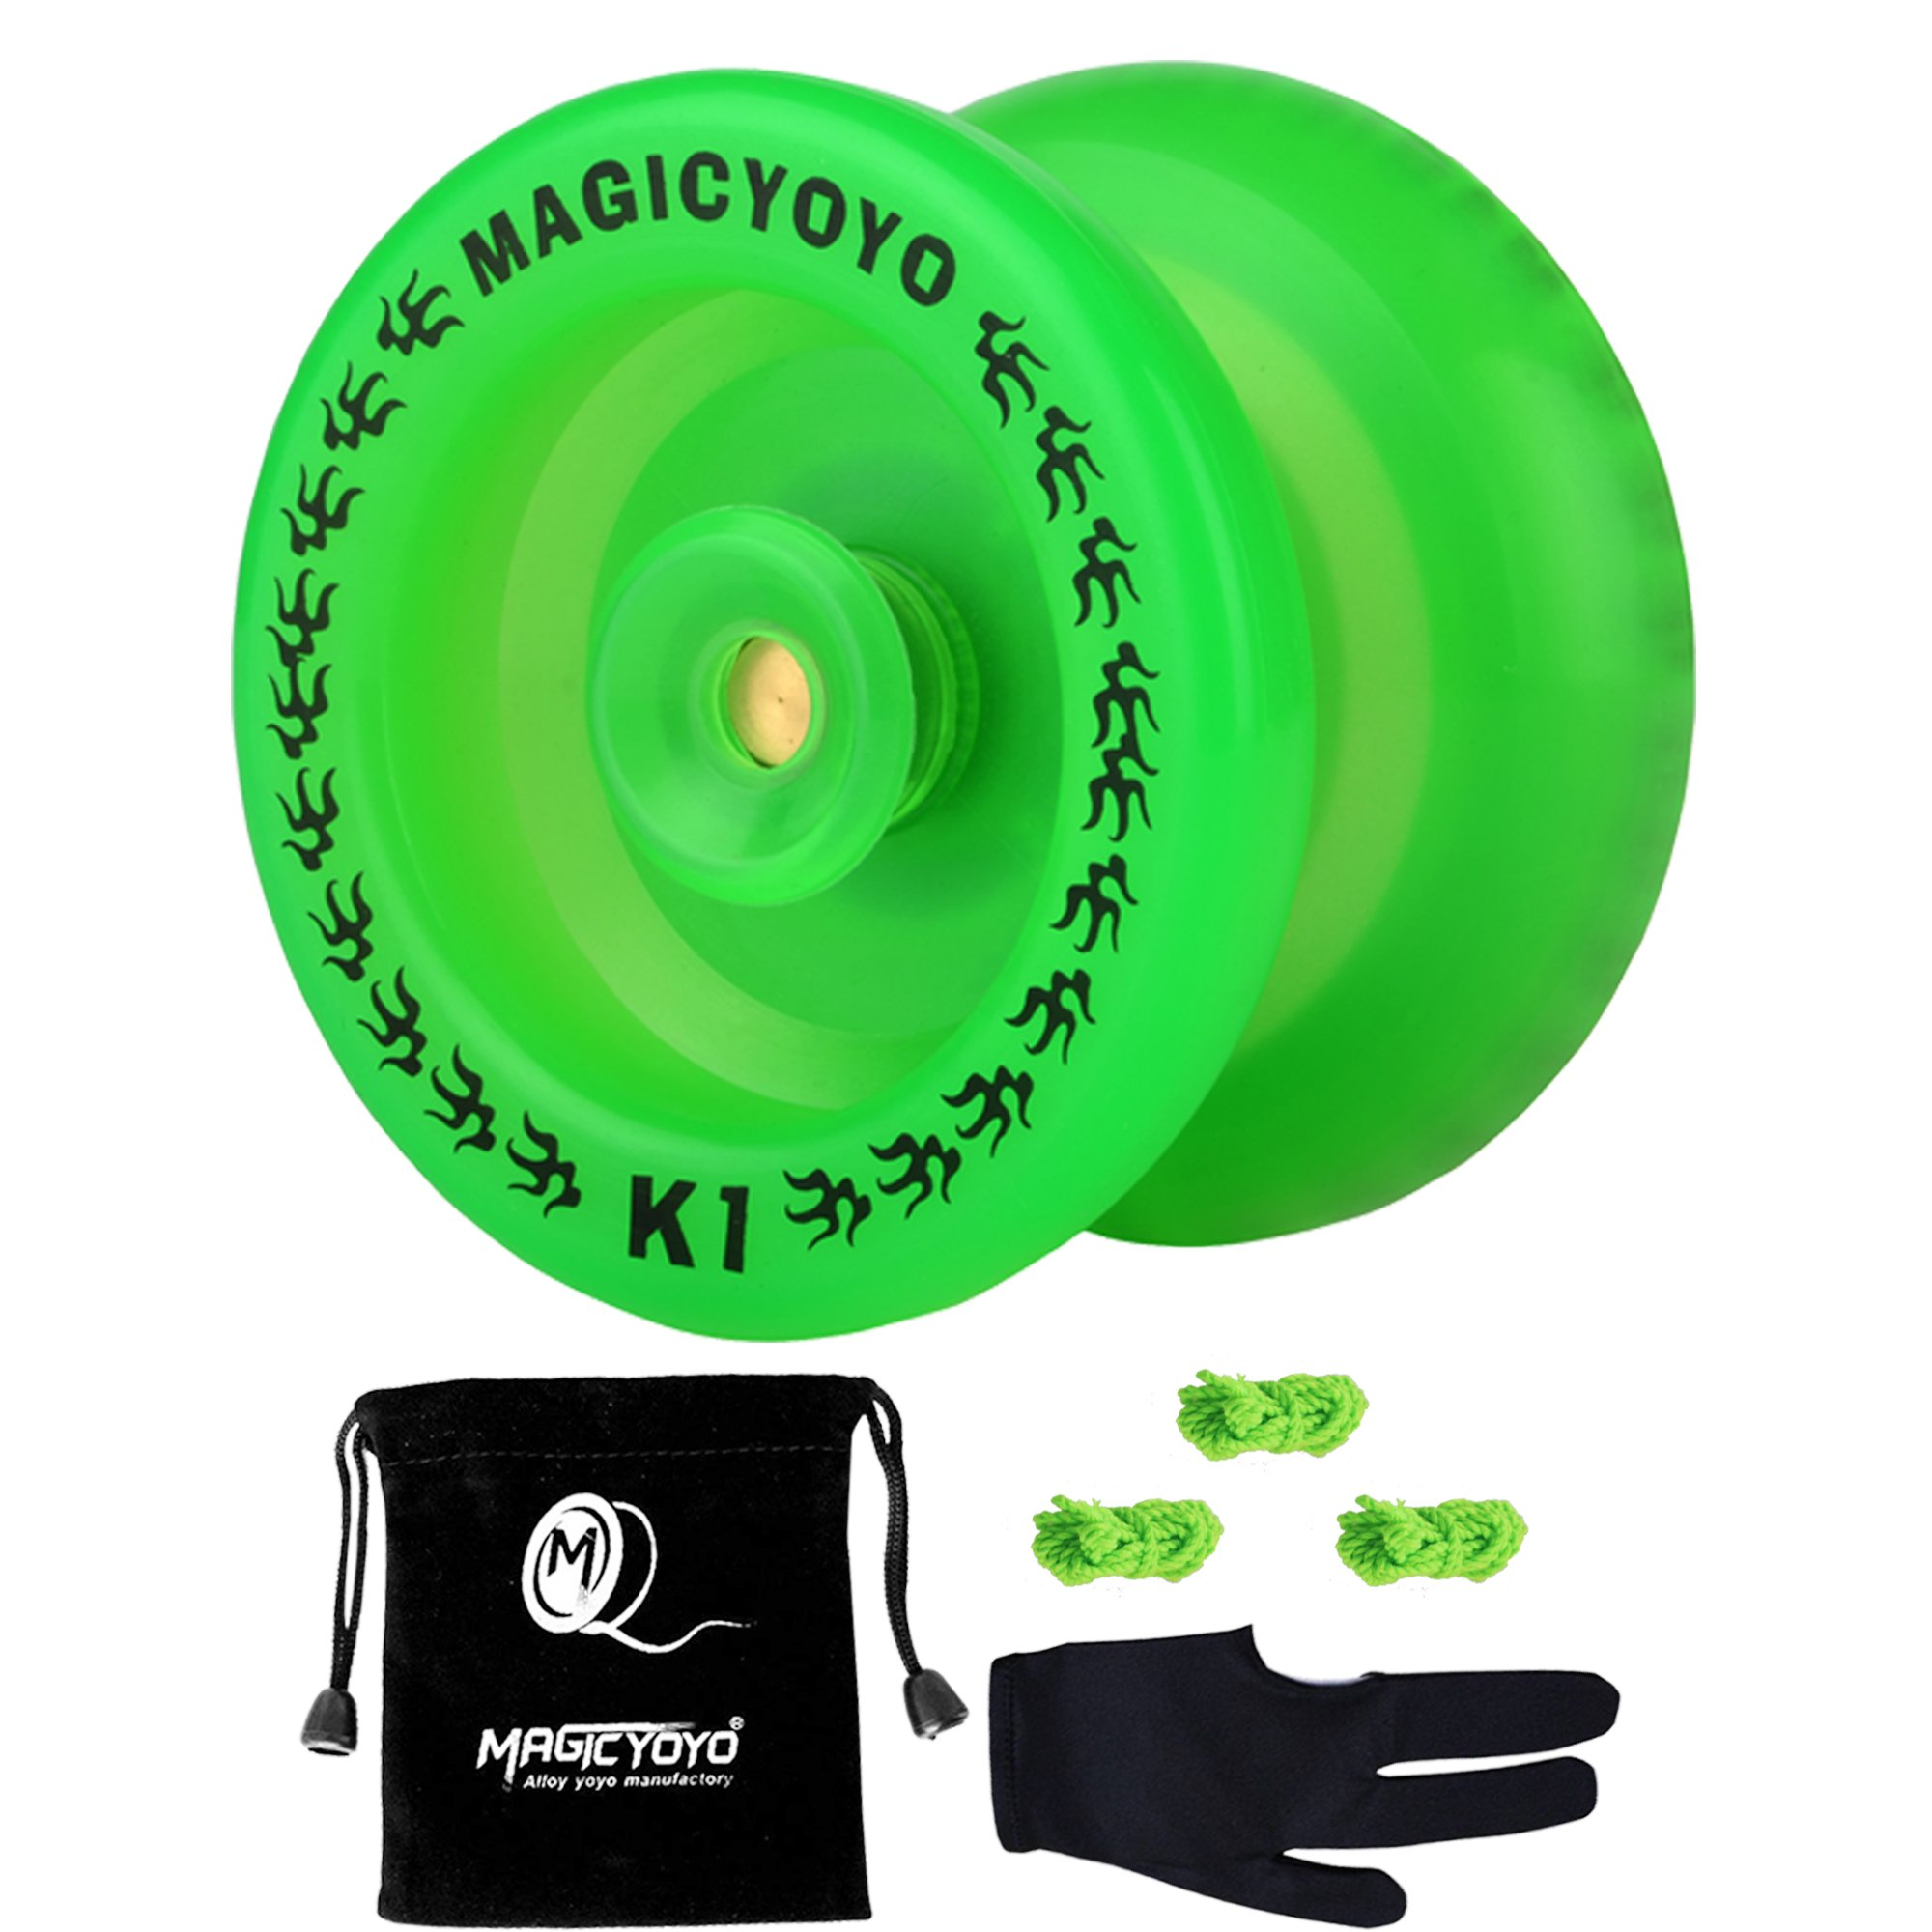 MAGICYOYO Non-Responsive K1 YoYo Glow in The Dark Green YoYo Kids Friends +Yo-yo Glove Gift+Yo-yo Sack+3 Strings